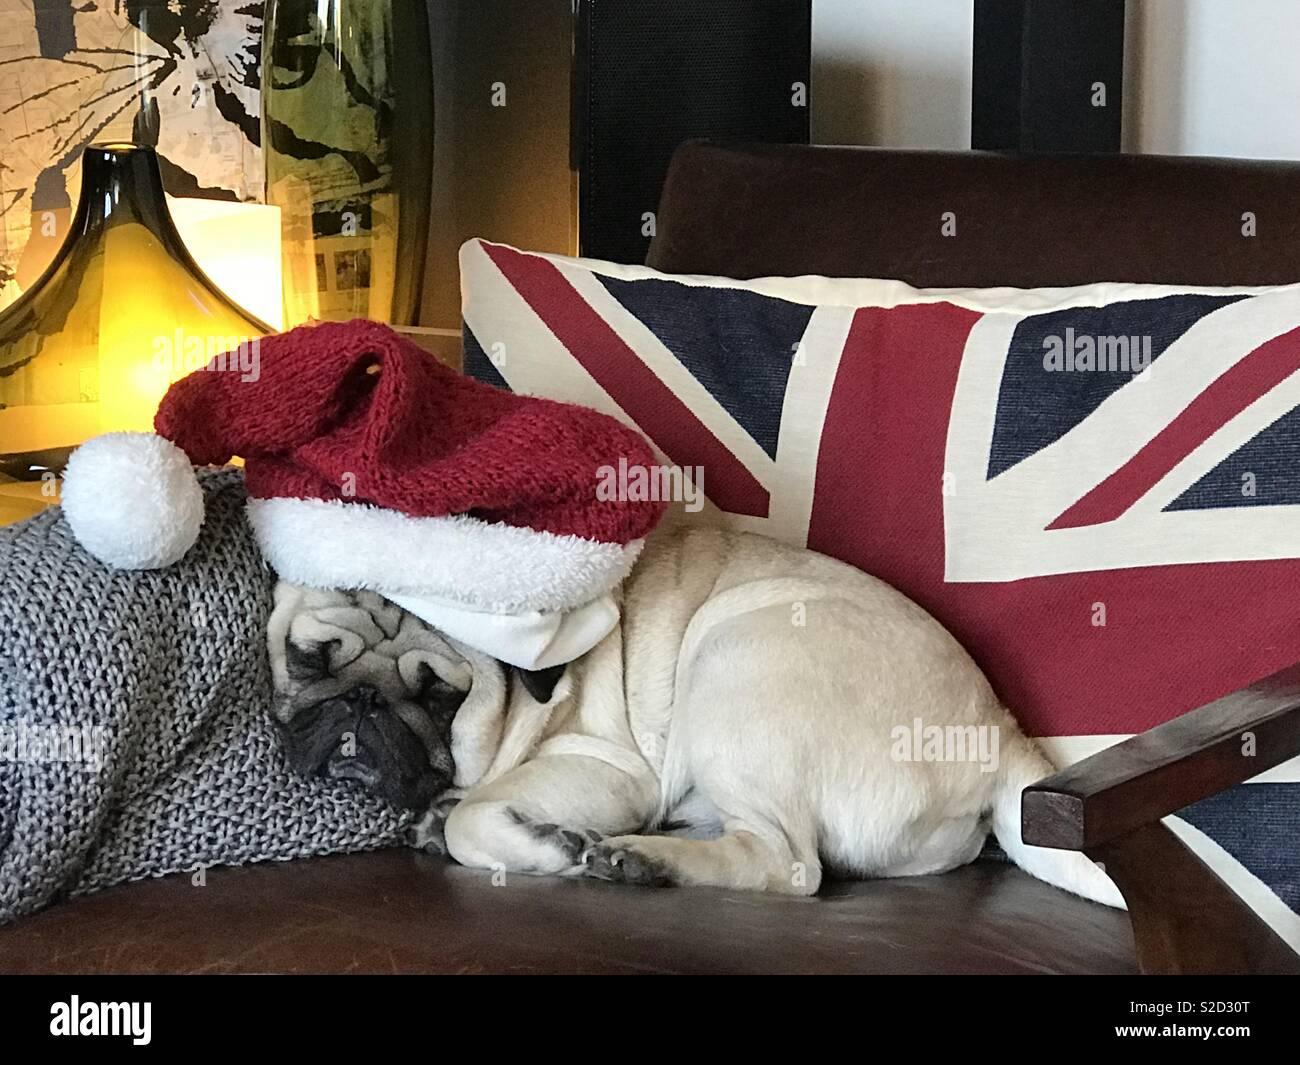 Christmas sleepy pug - Stock Image